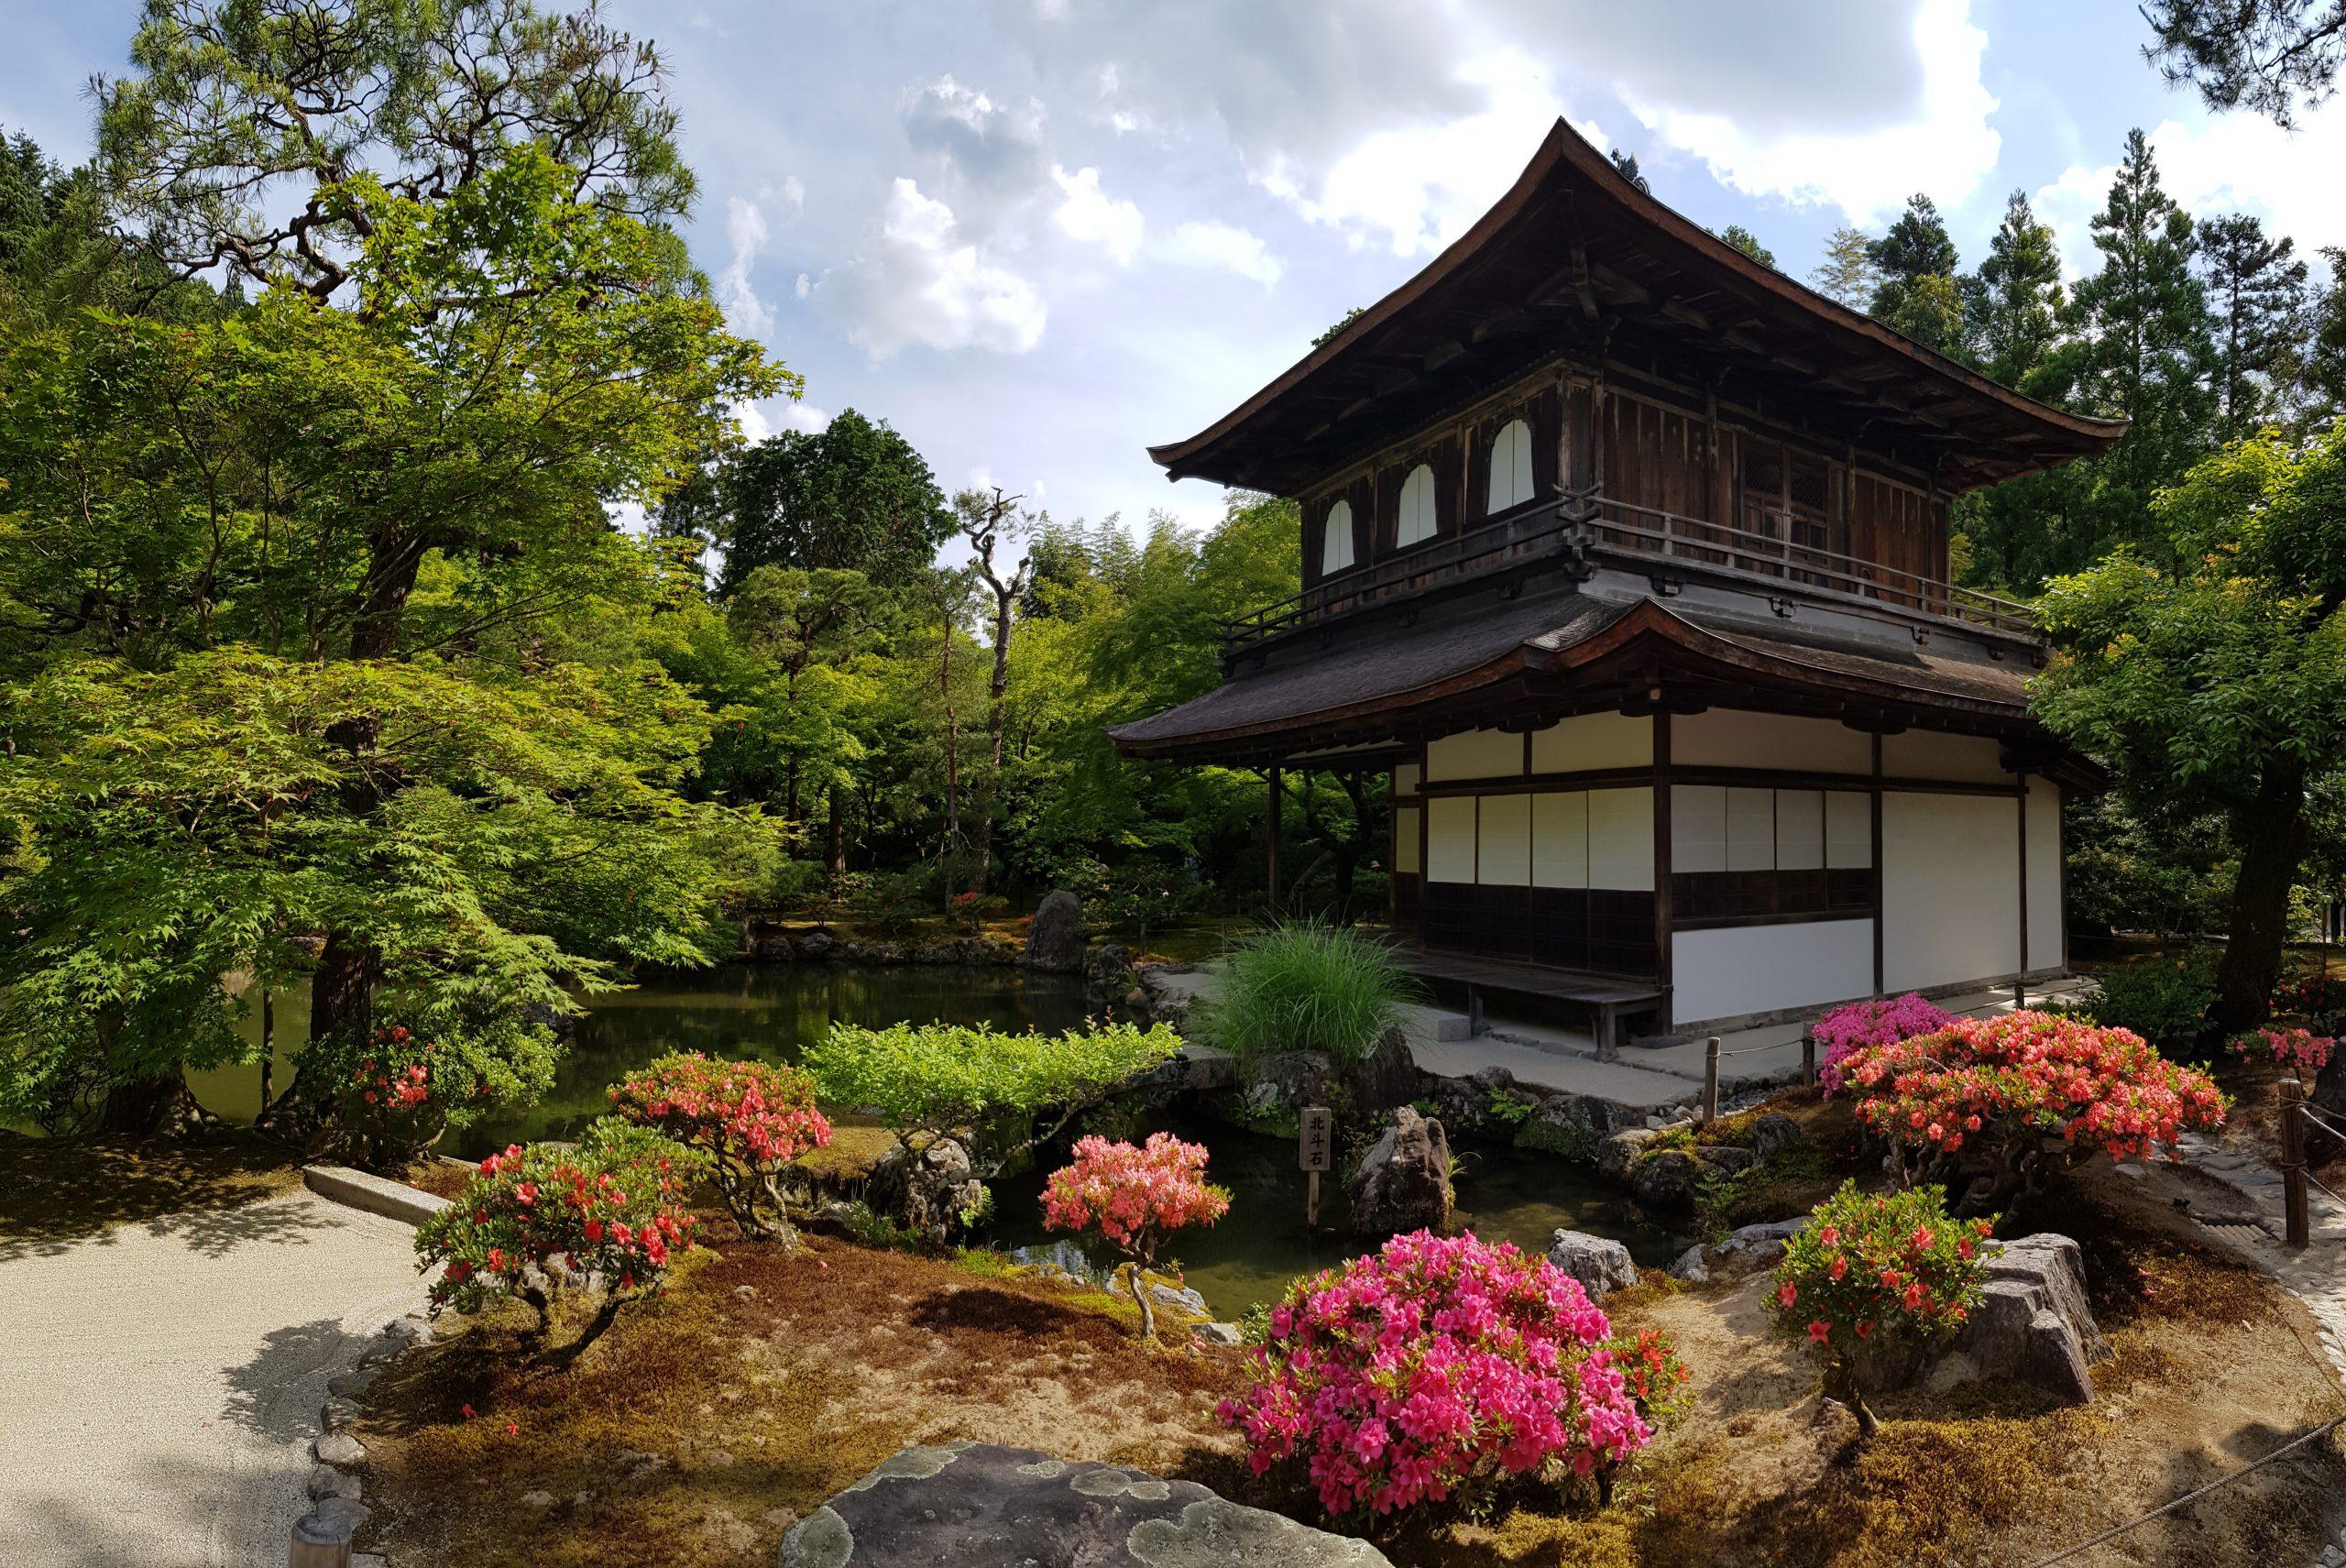 Ginkakuji (Silver Pavilion), Kyoto